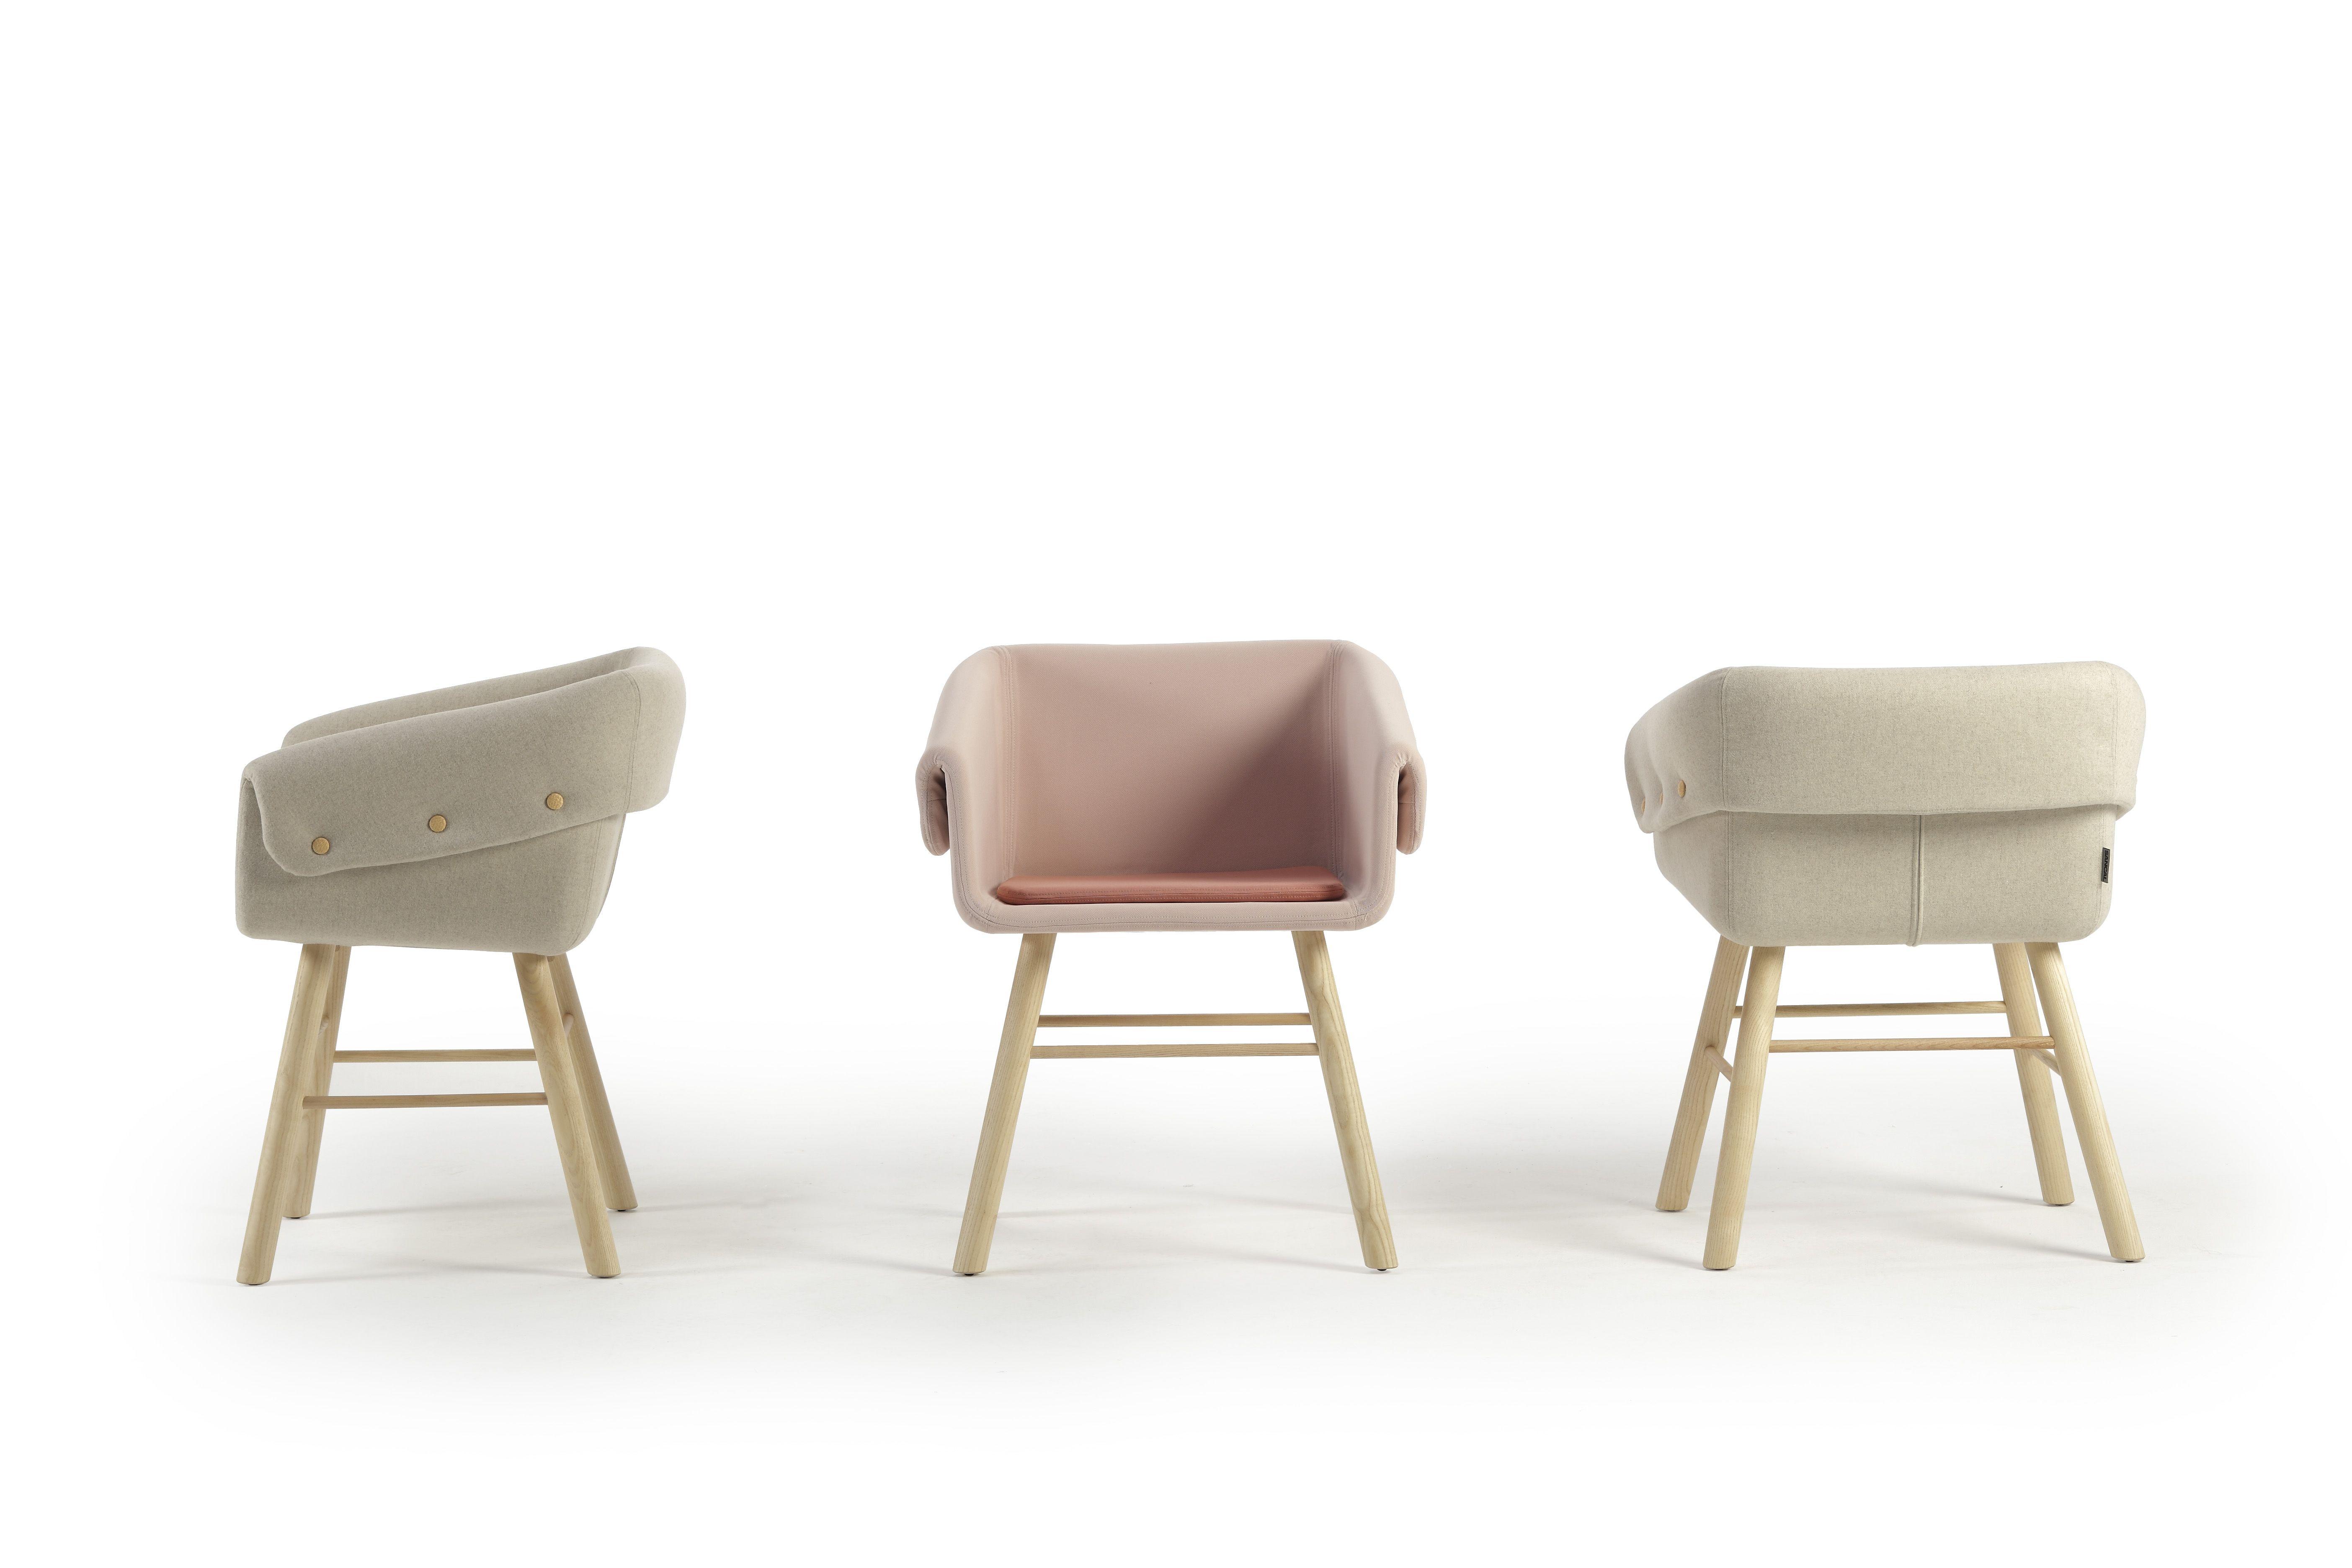 SANCAL Collar chair by Skrivo Design